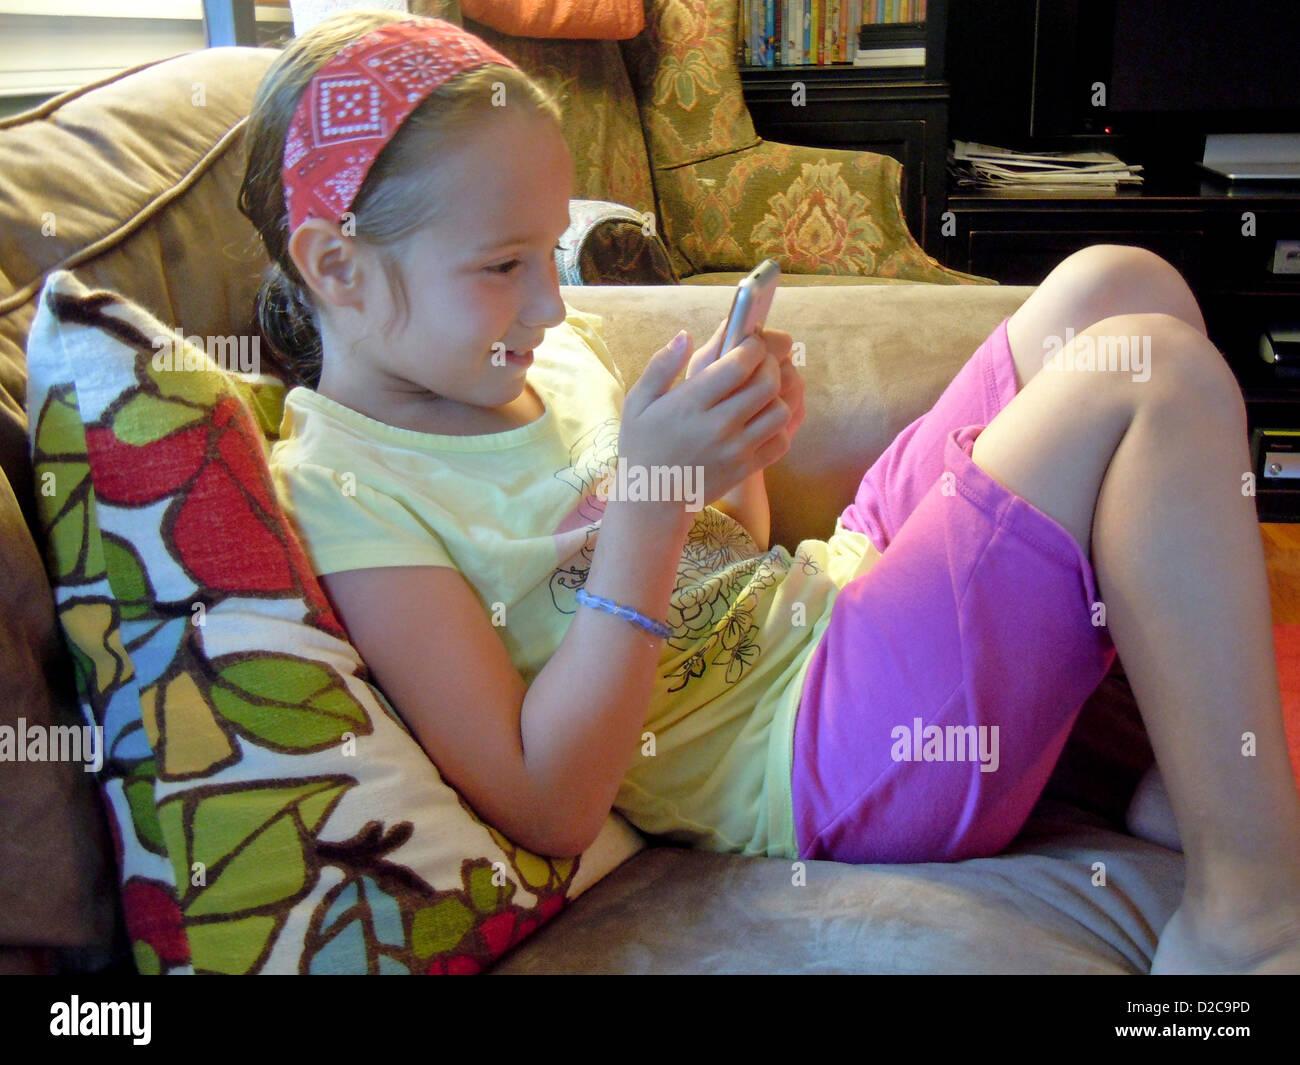 7 Year-Old Girl, Winchester, Massachusetts - Stock Image